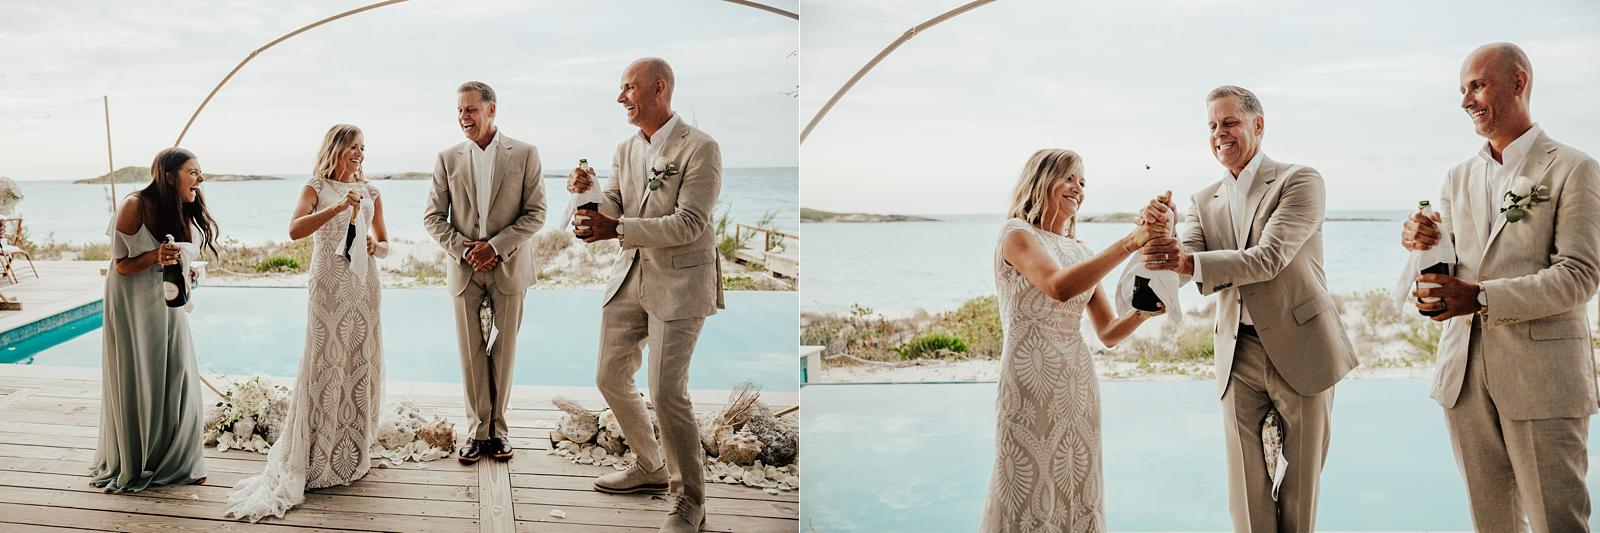 Jenni & Andrew Intimate Beach Destination Wedding in Little Exuma, Bahamas_0513.jpg